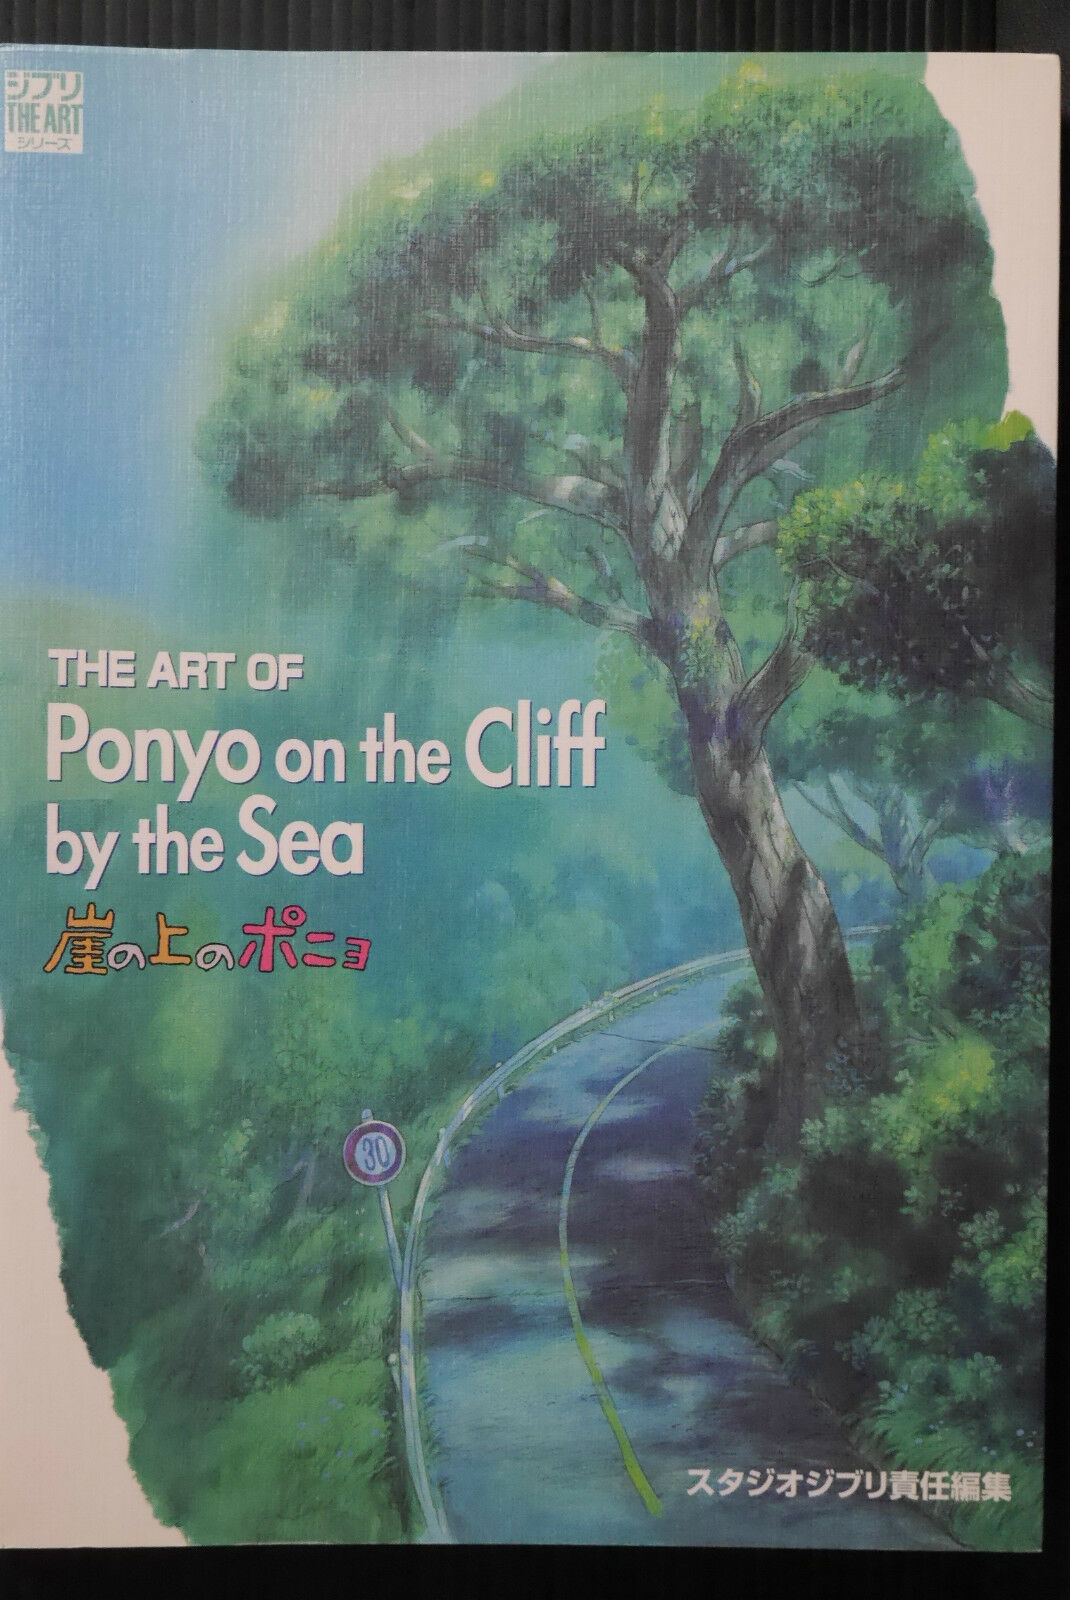 JAPAN Ponyo on Cliff by Sea Hayao Miyazaki book roman album